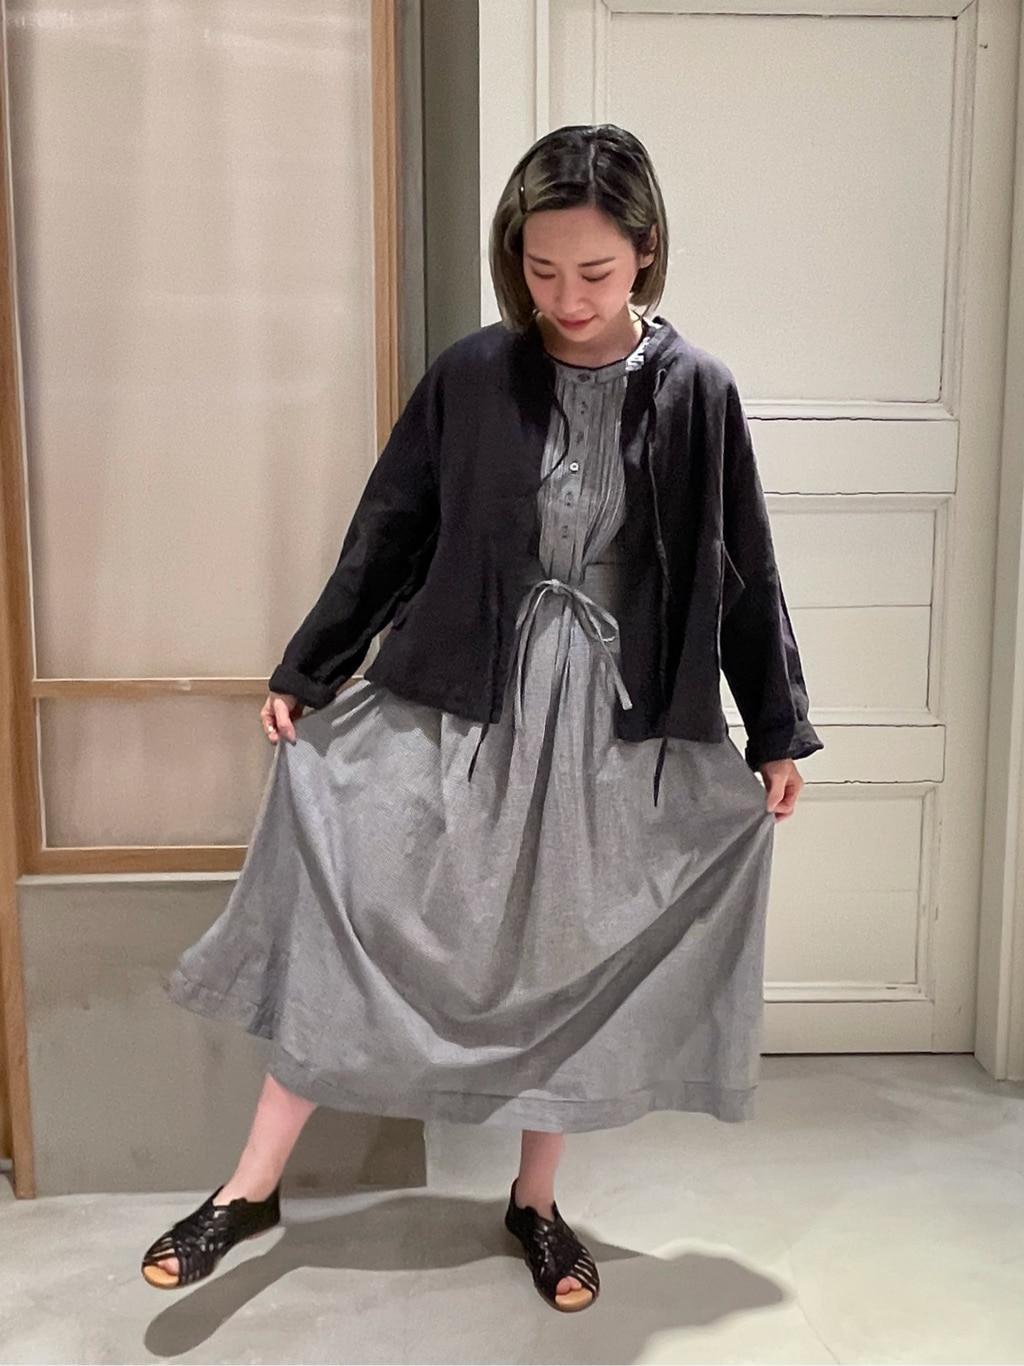 bulle de savon 渋谷スクランブルスクエア 身長:154cm 2021.05.07